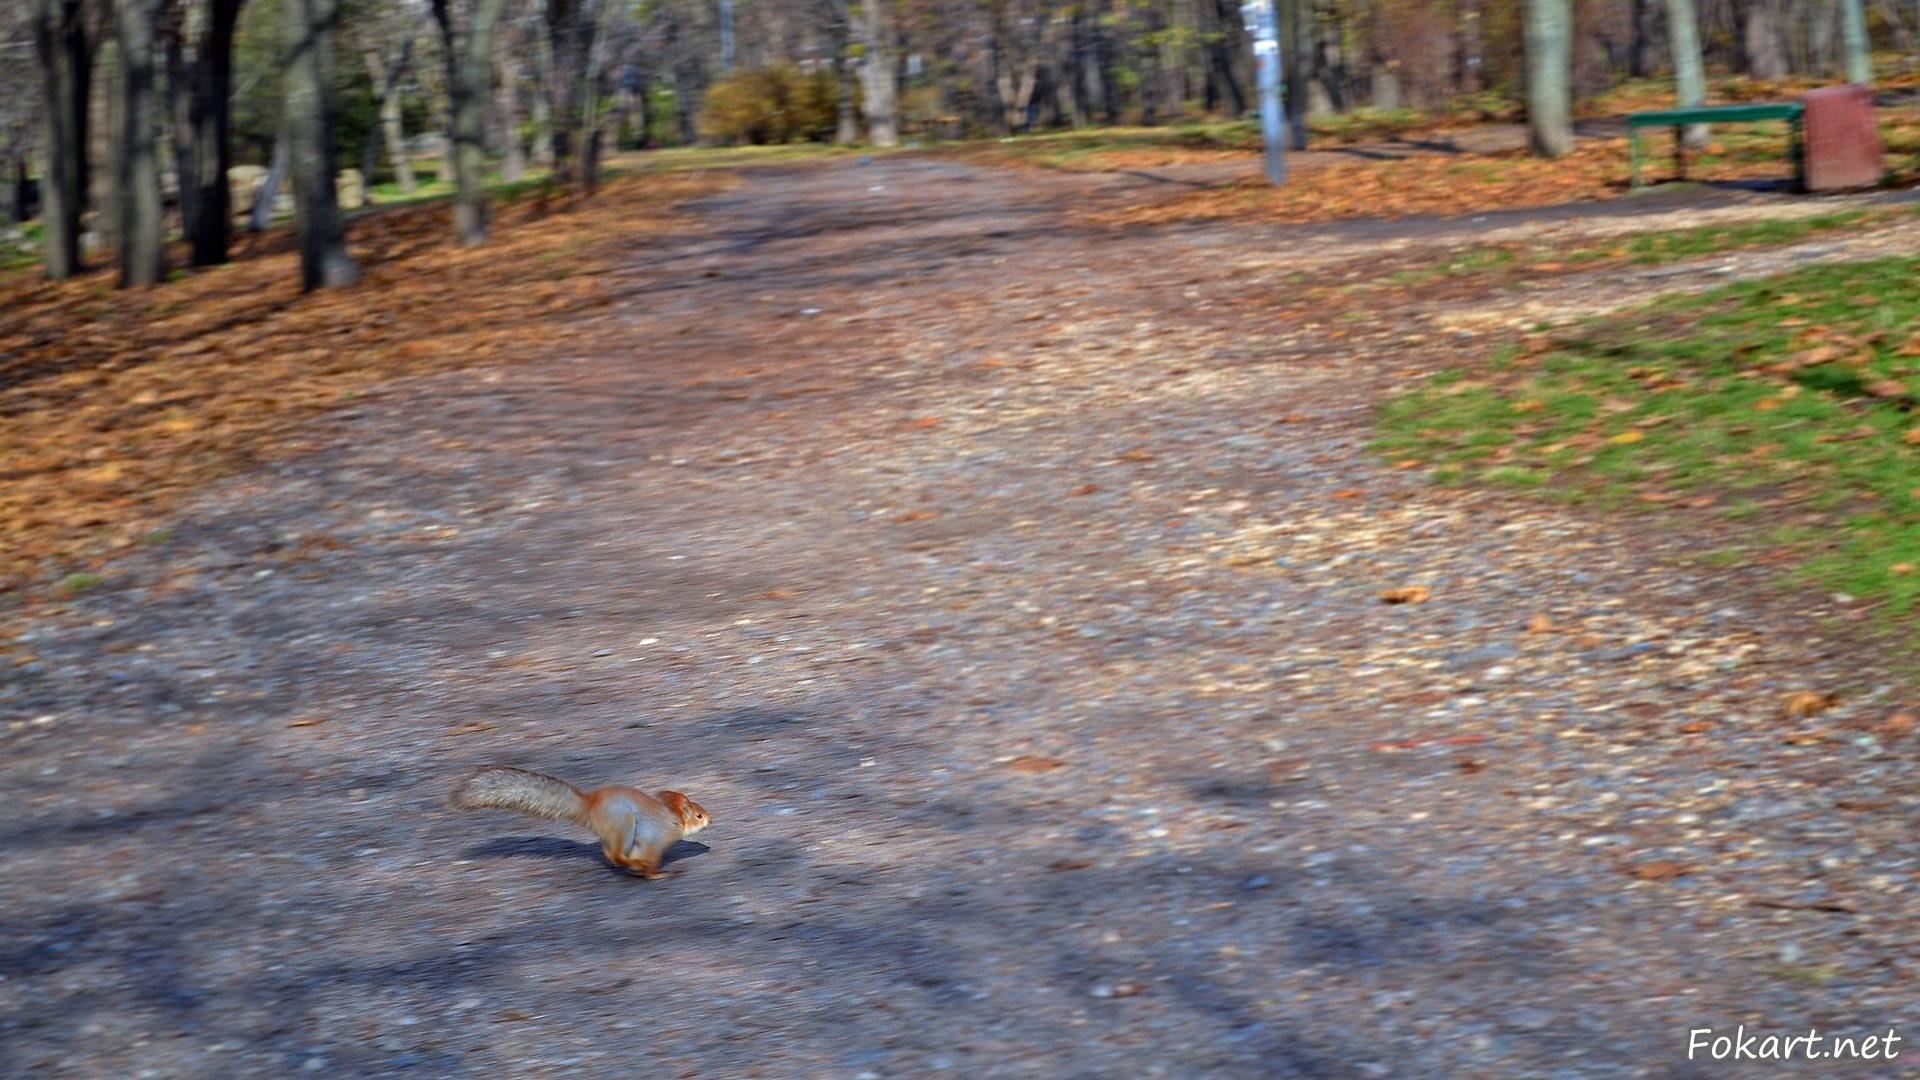 Белка бегом пересекает дорожку осеннего парка